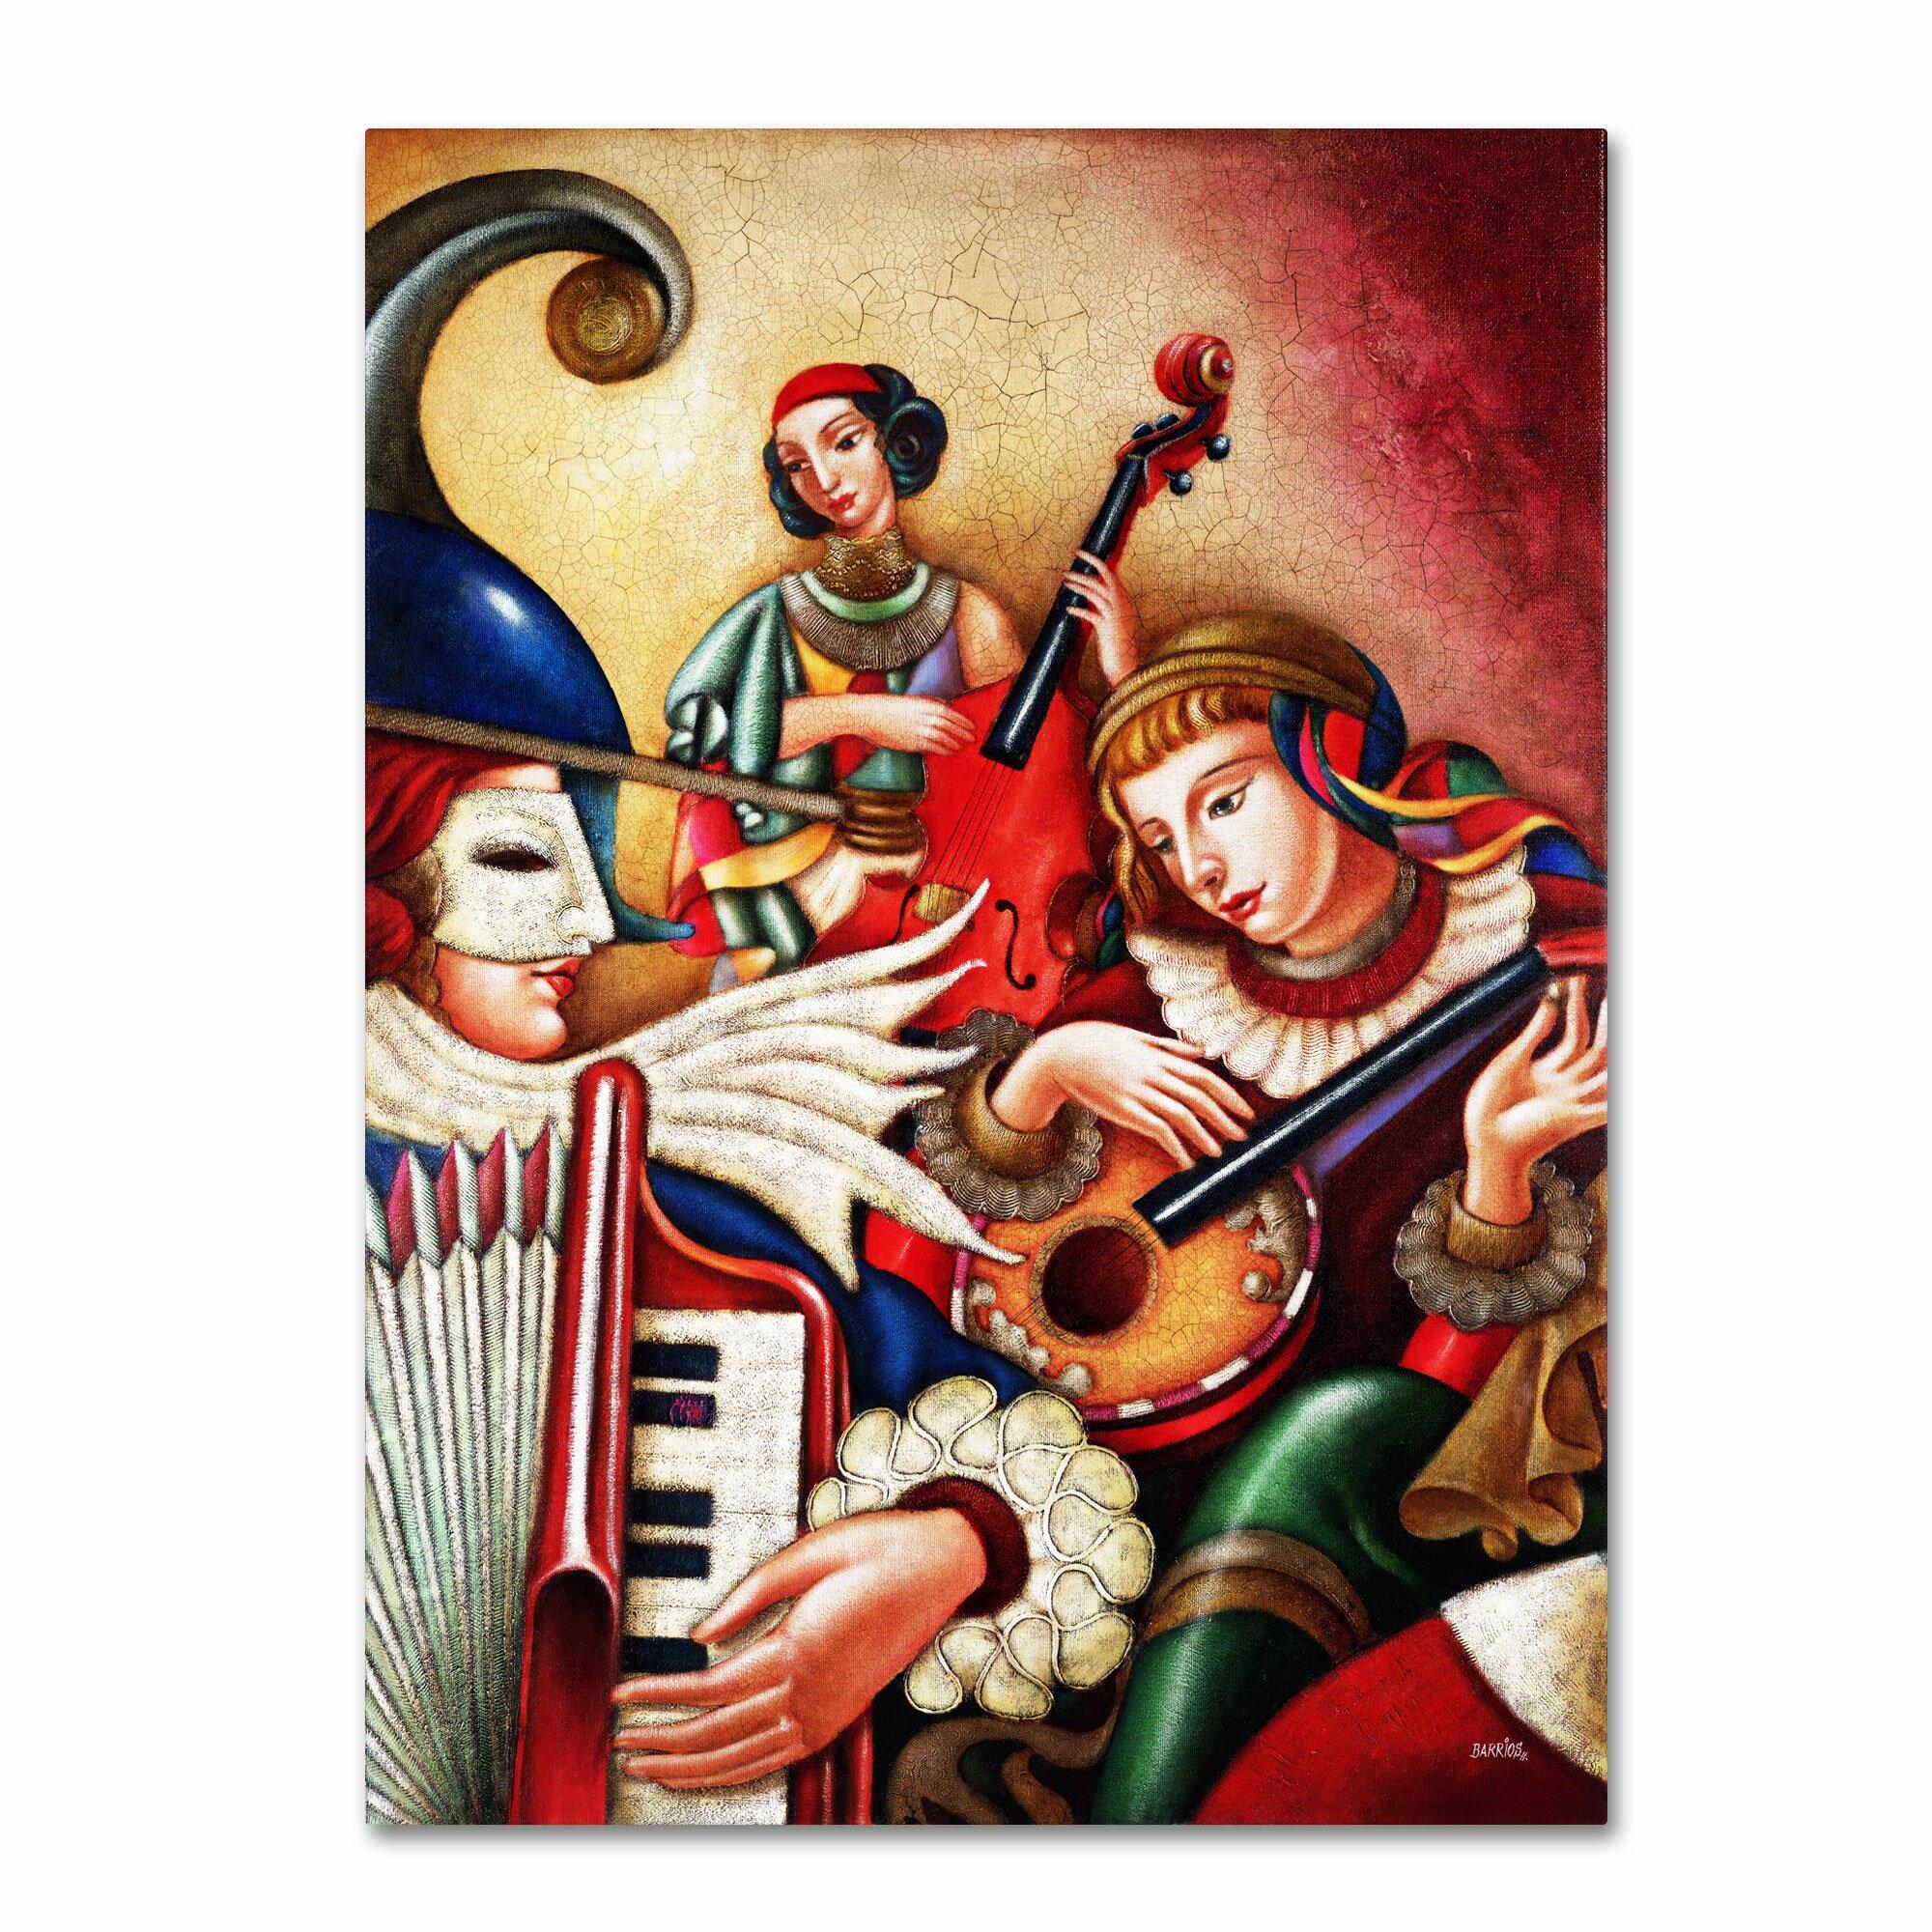 Trademark Art Quot Inspiriacion Quot By Edgar Barrios Painting